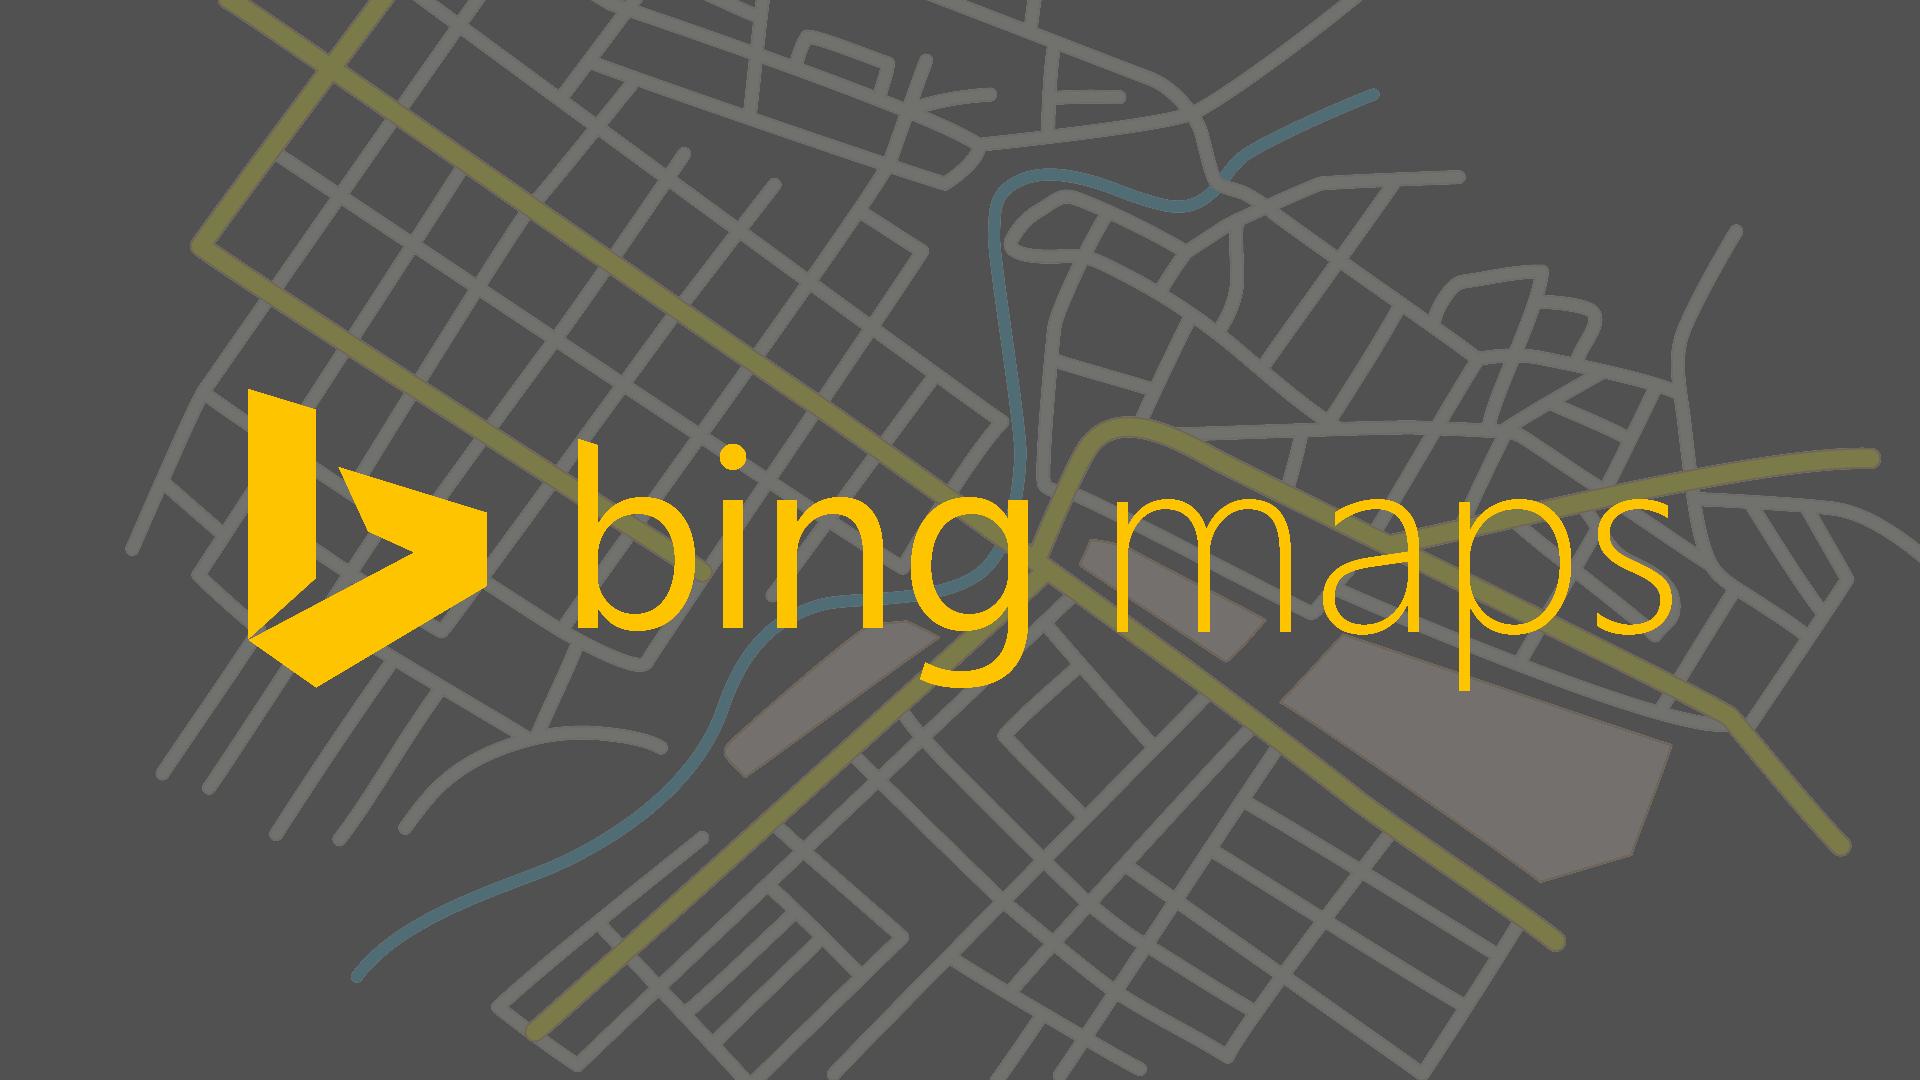 bing-maps-word5-ss-1920